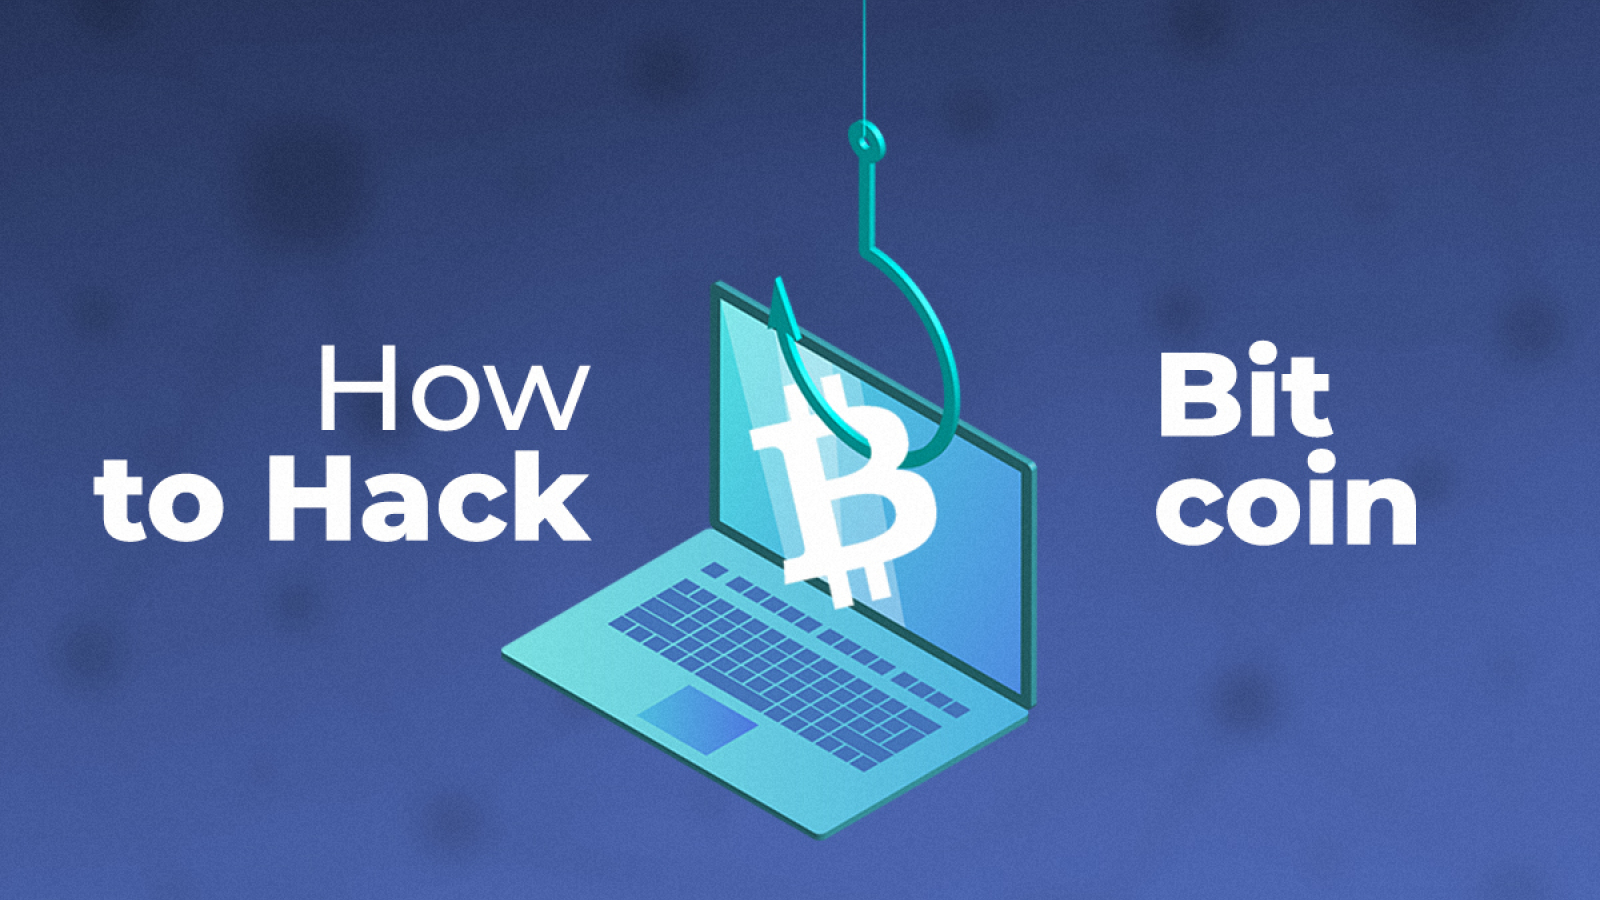 Bitcoins hacks money on sports betting